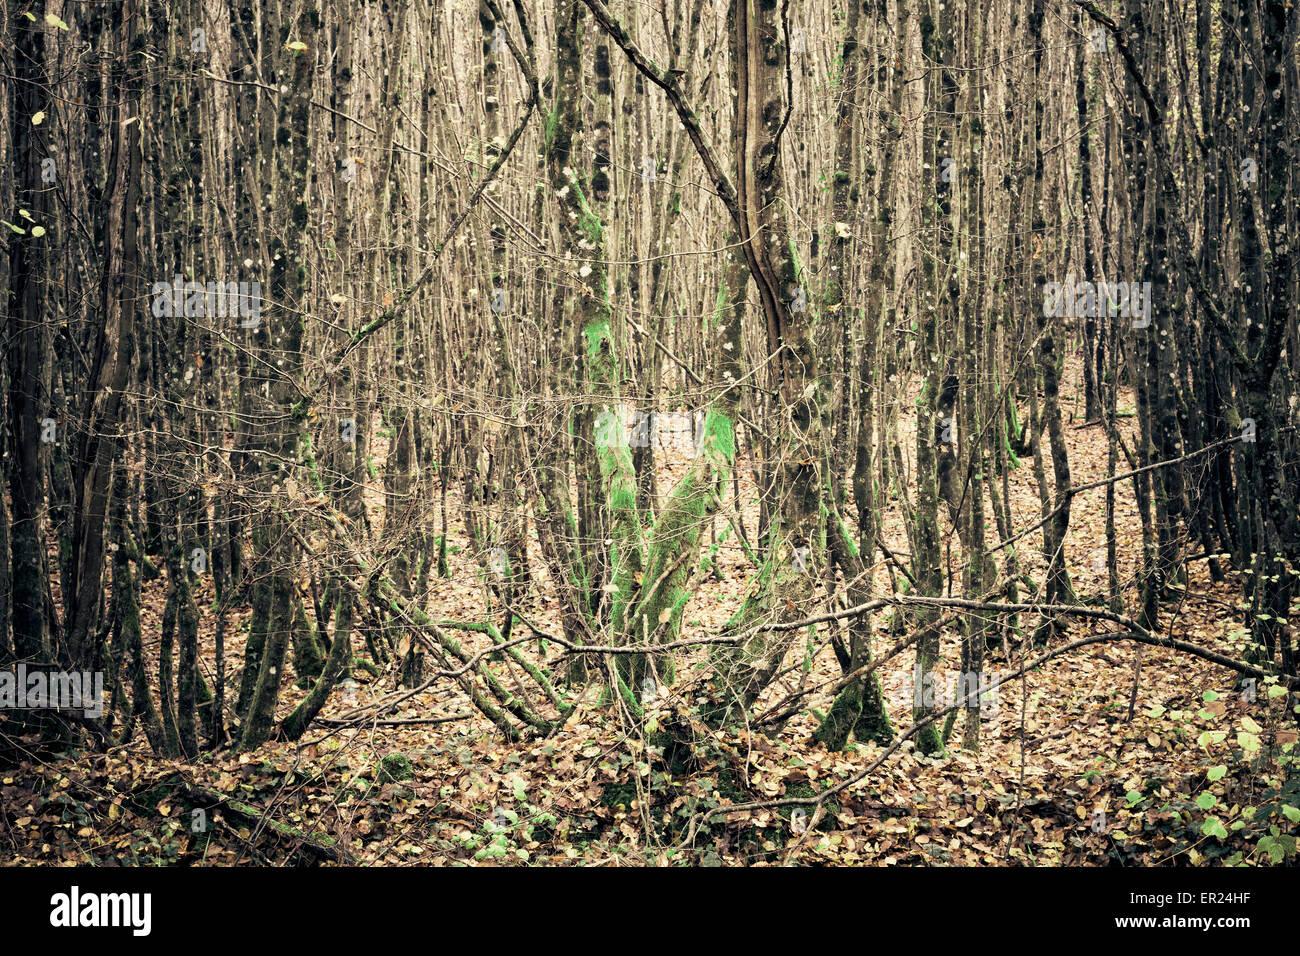 Baum Bäume Holz Wald Stockbild